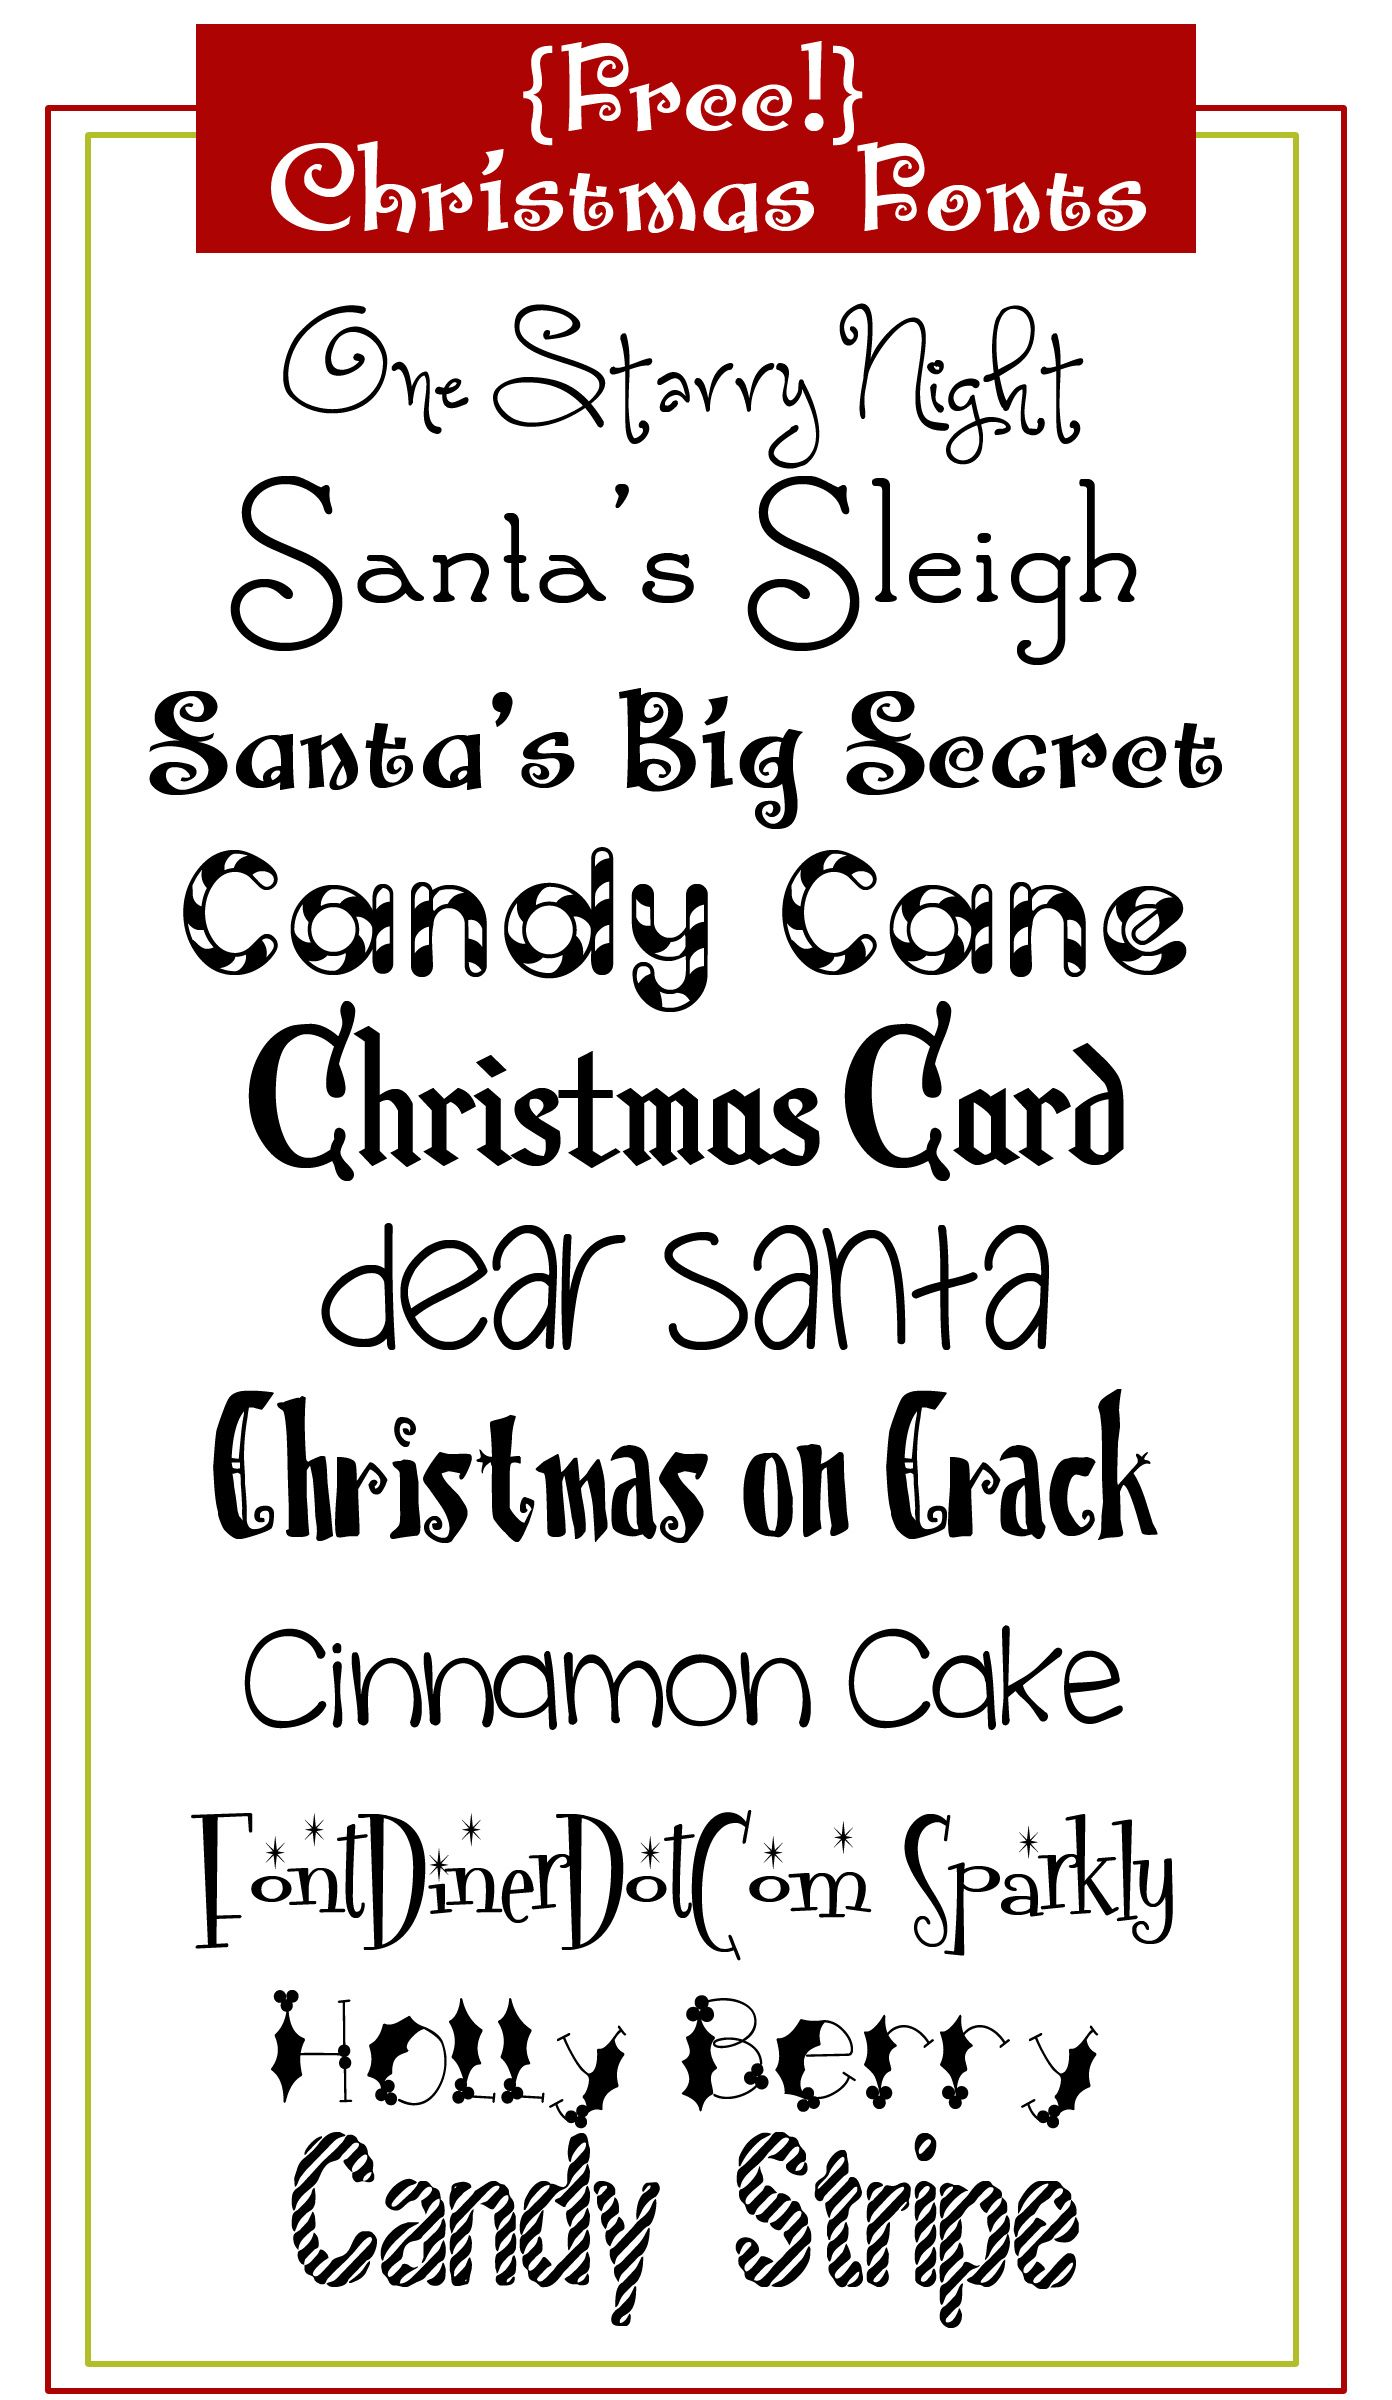 Free Christmas Fonts Christmas fonts, Christmas fonts